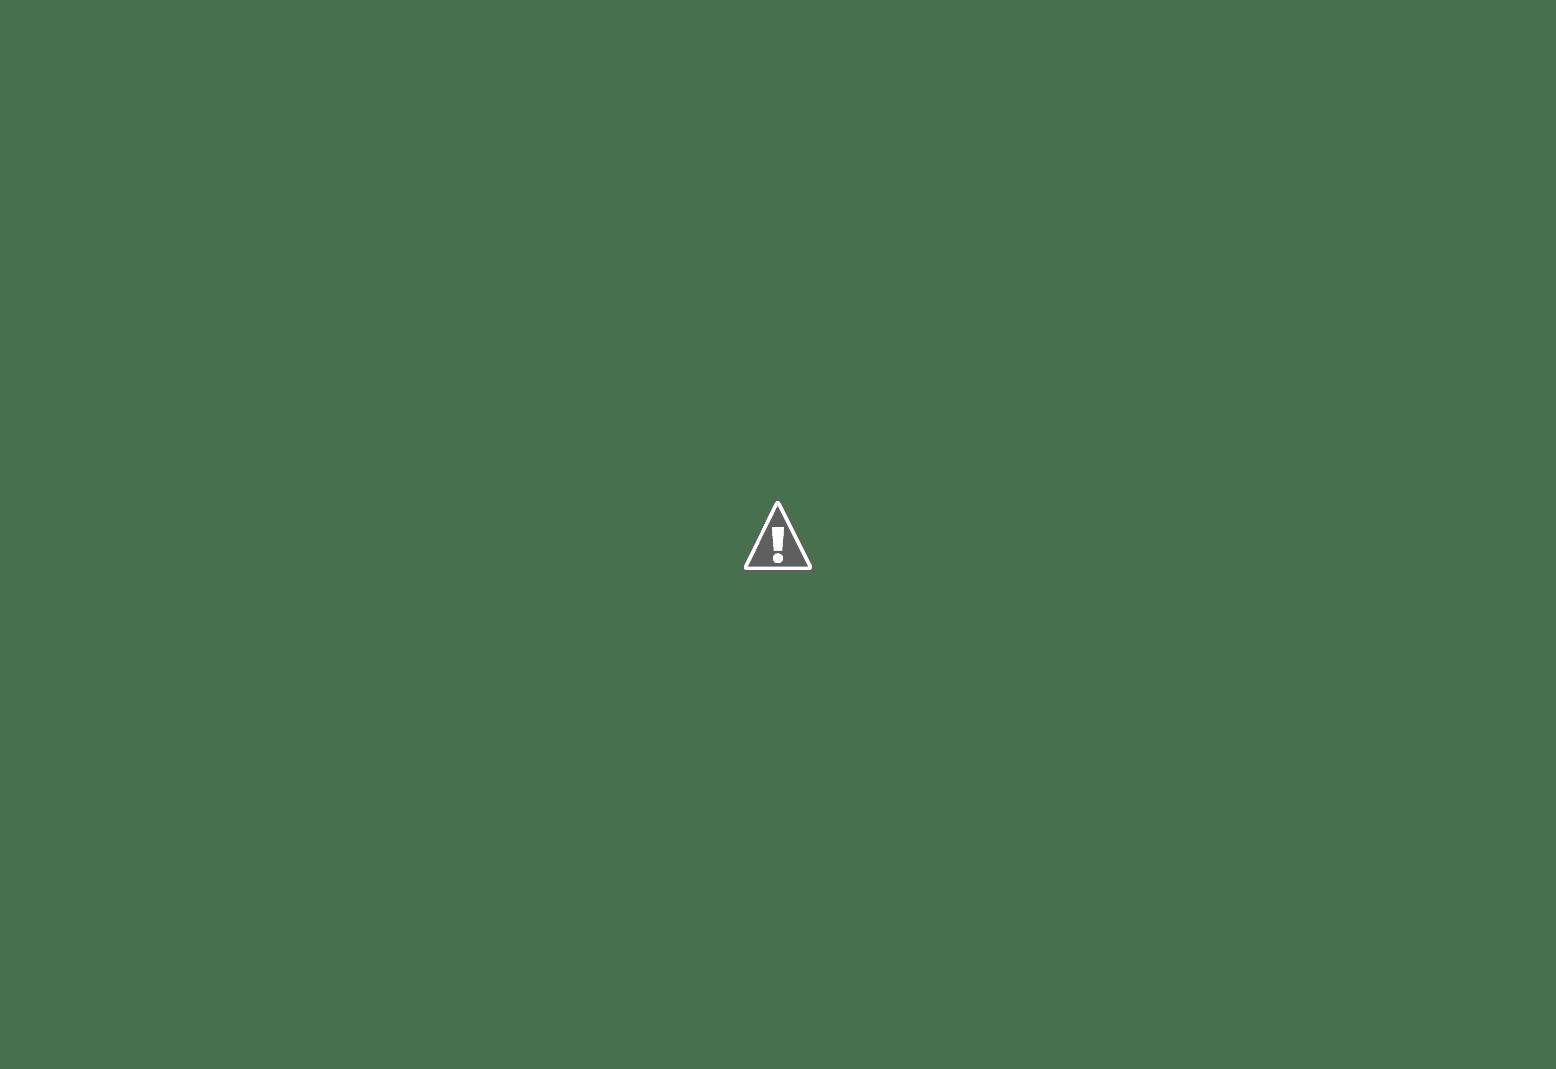 26.10.2017 - Girls run the world